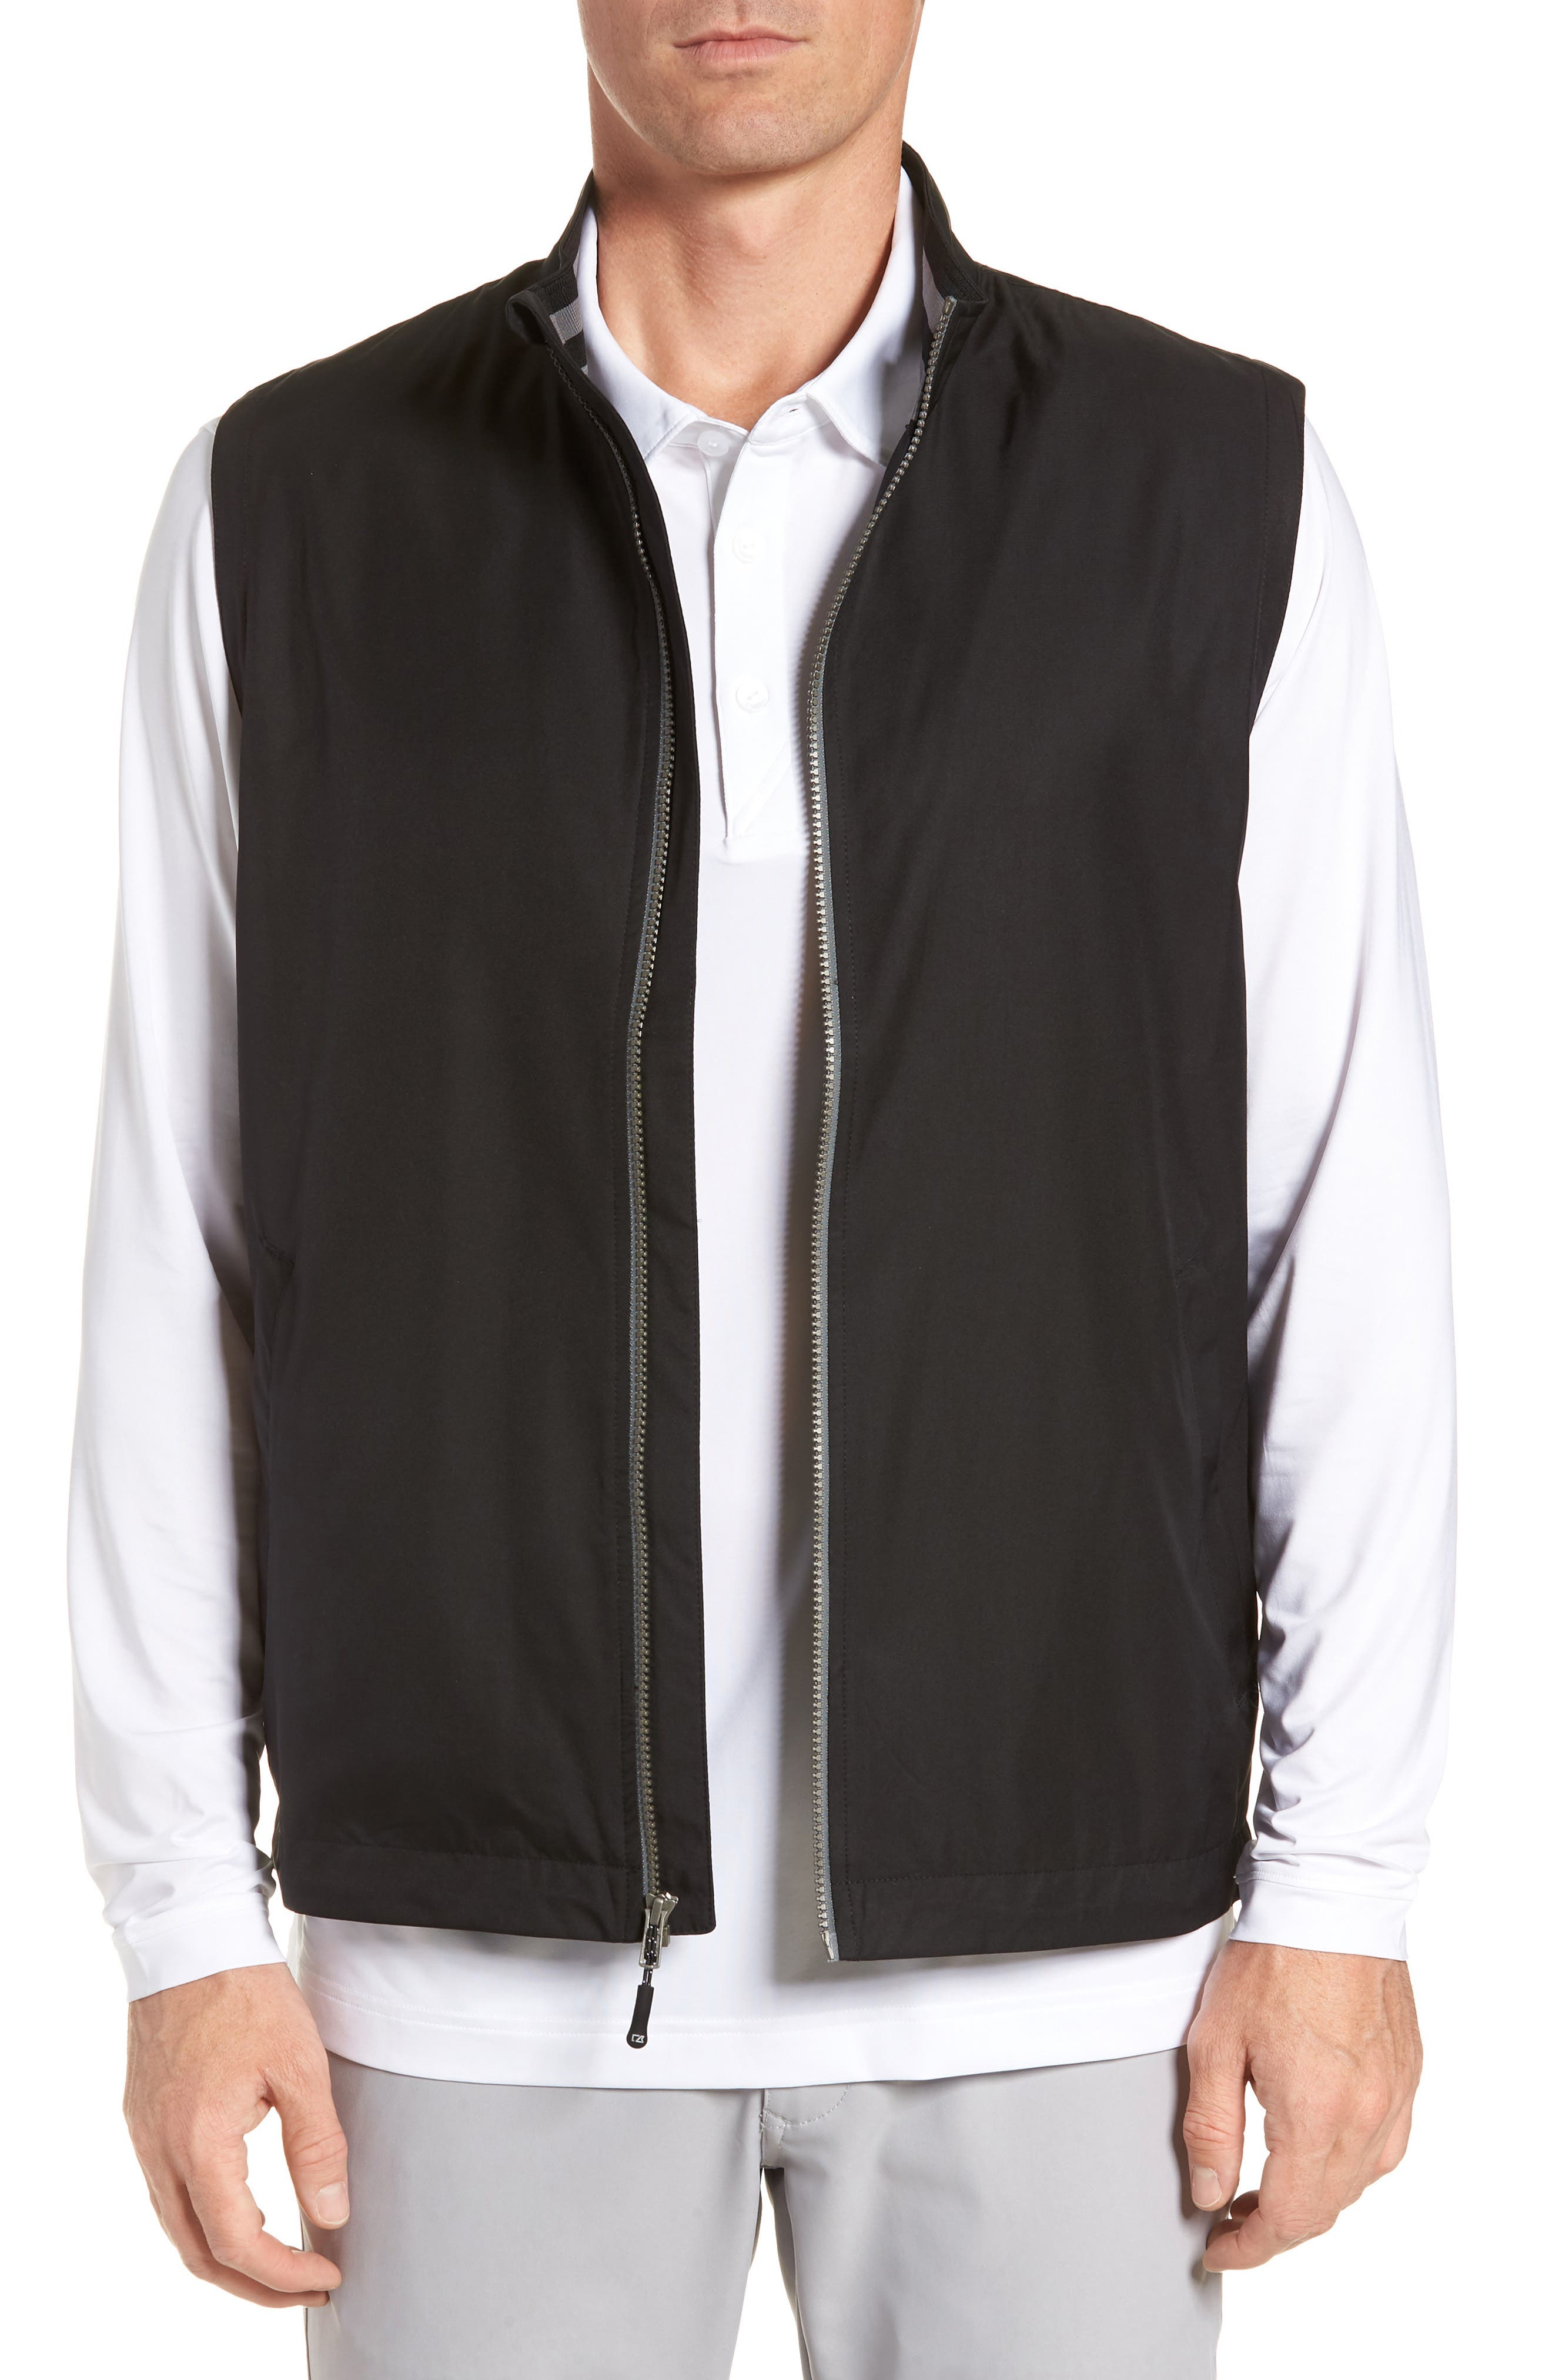 Nine Iron DryTec Zip Vest,                             Main thumbnail 1, color,                             BLACK